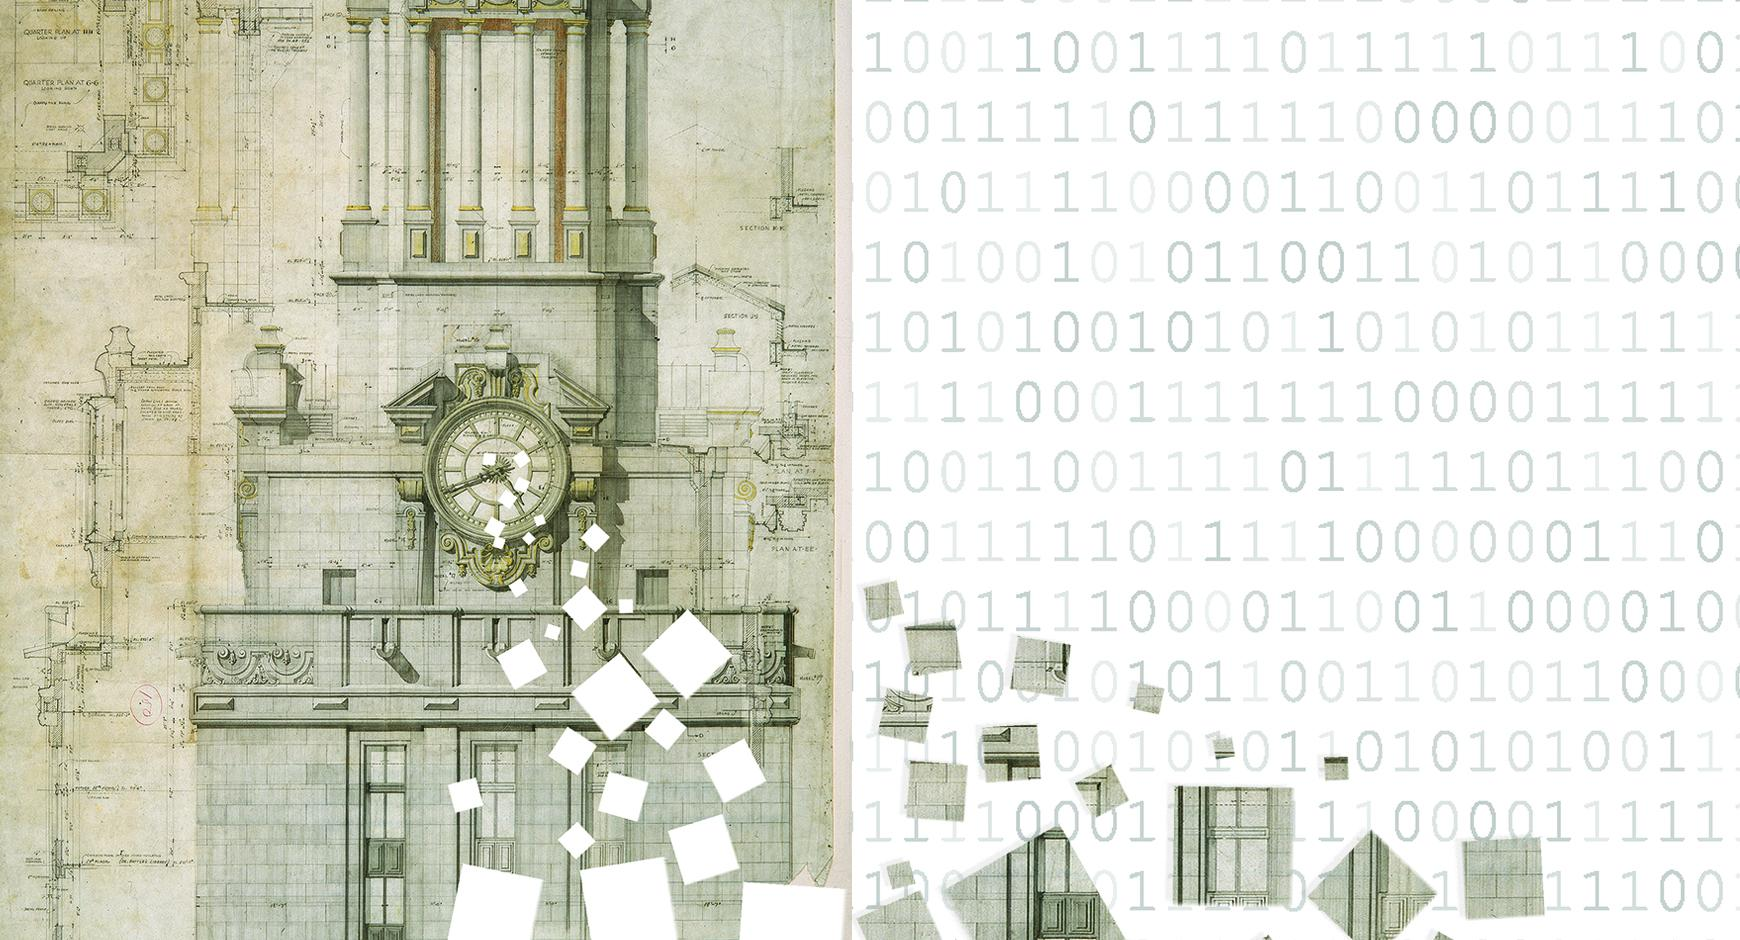 drawing of UT's tower pixelating into binary code